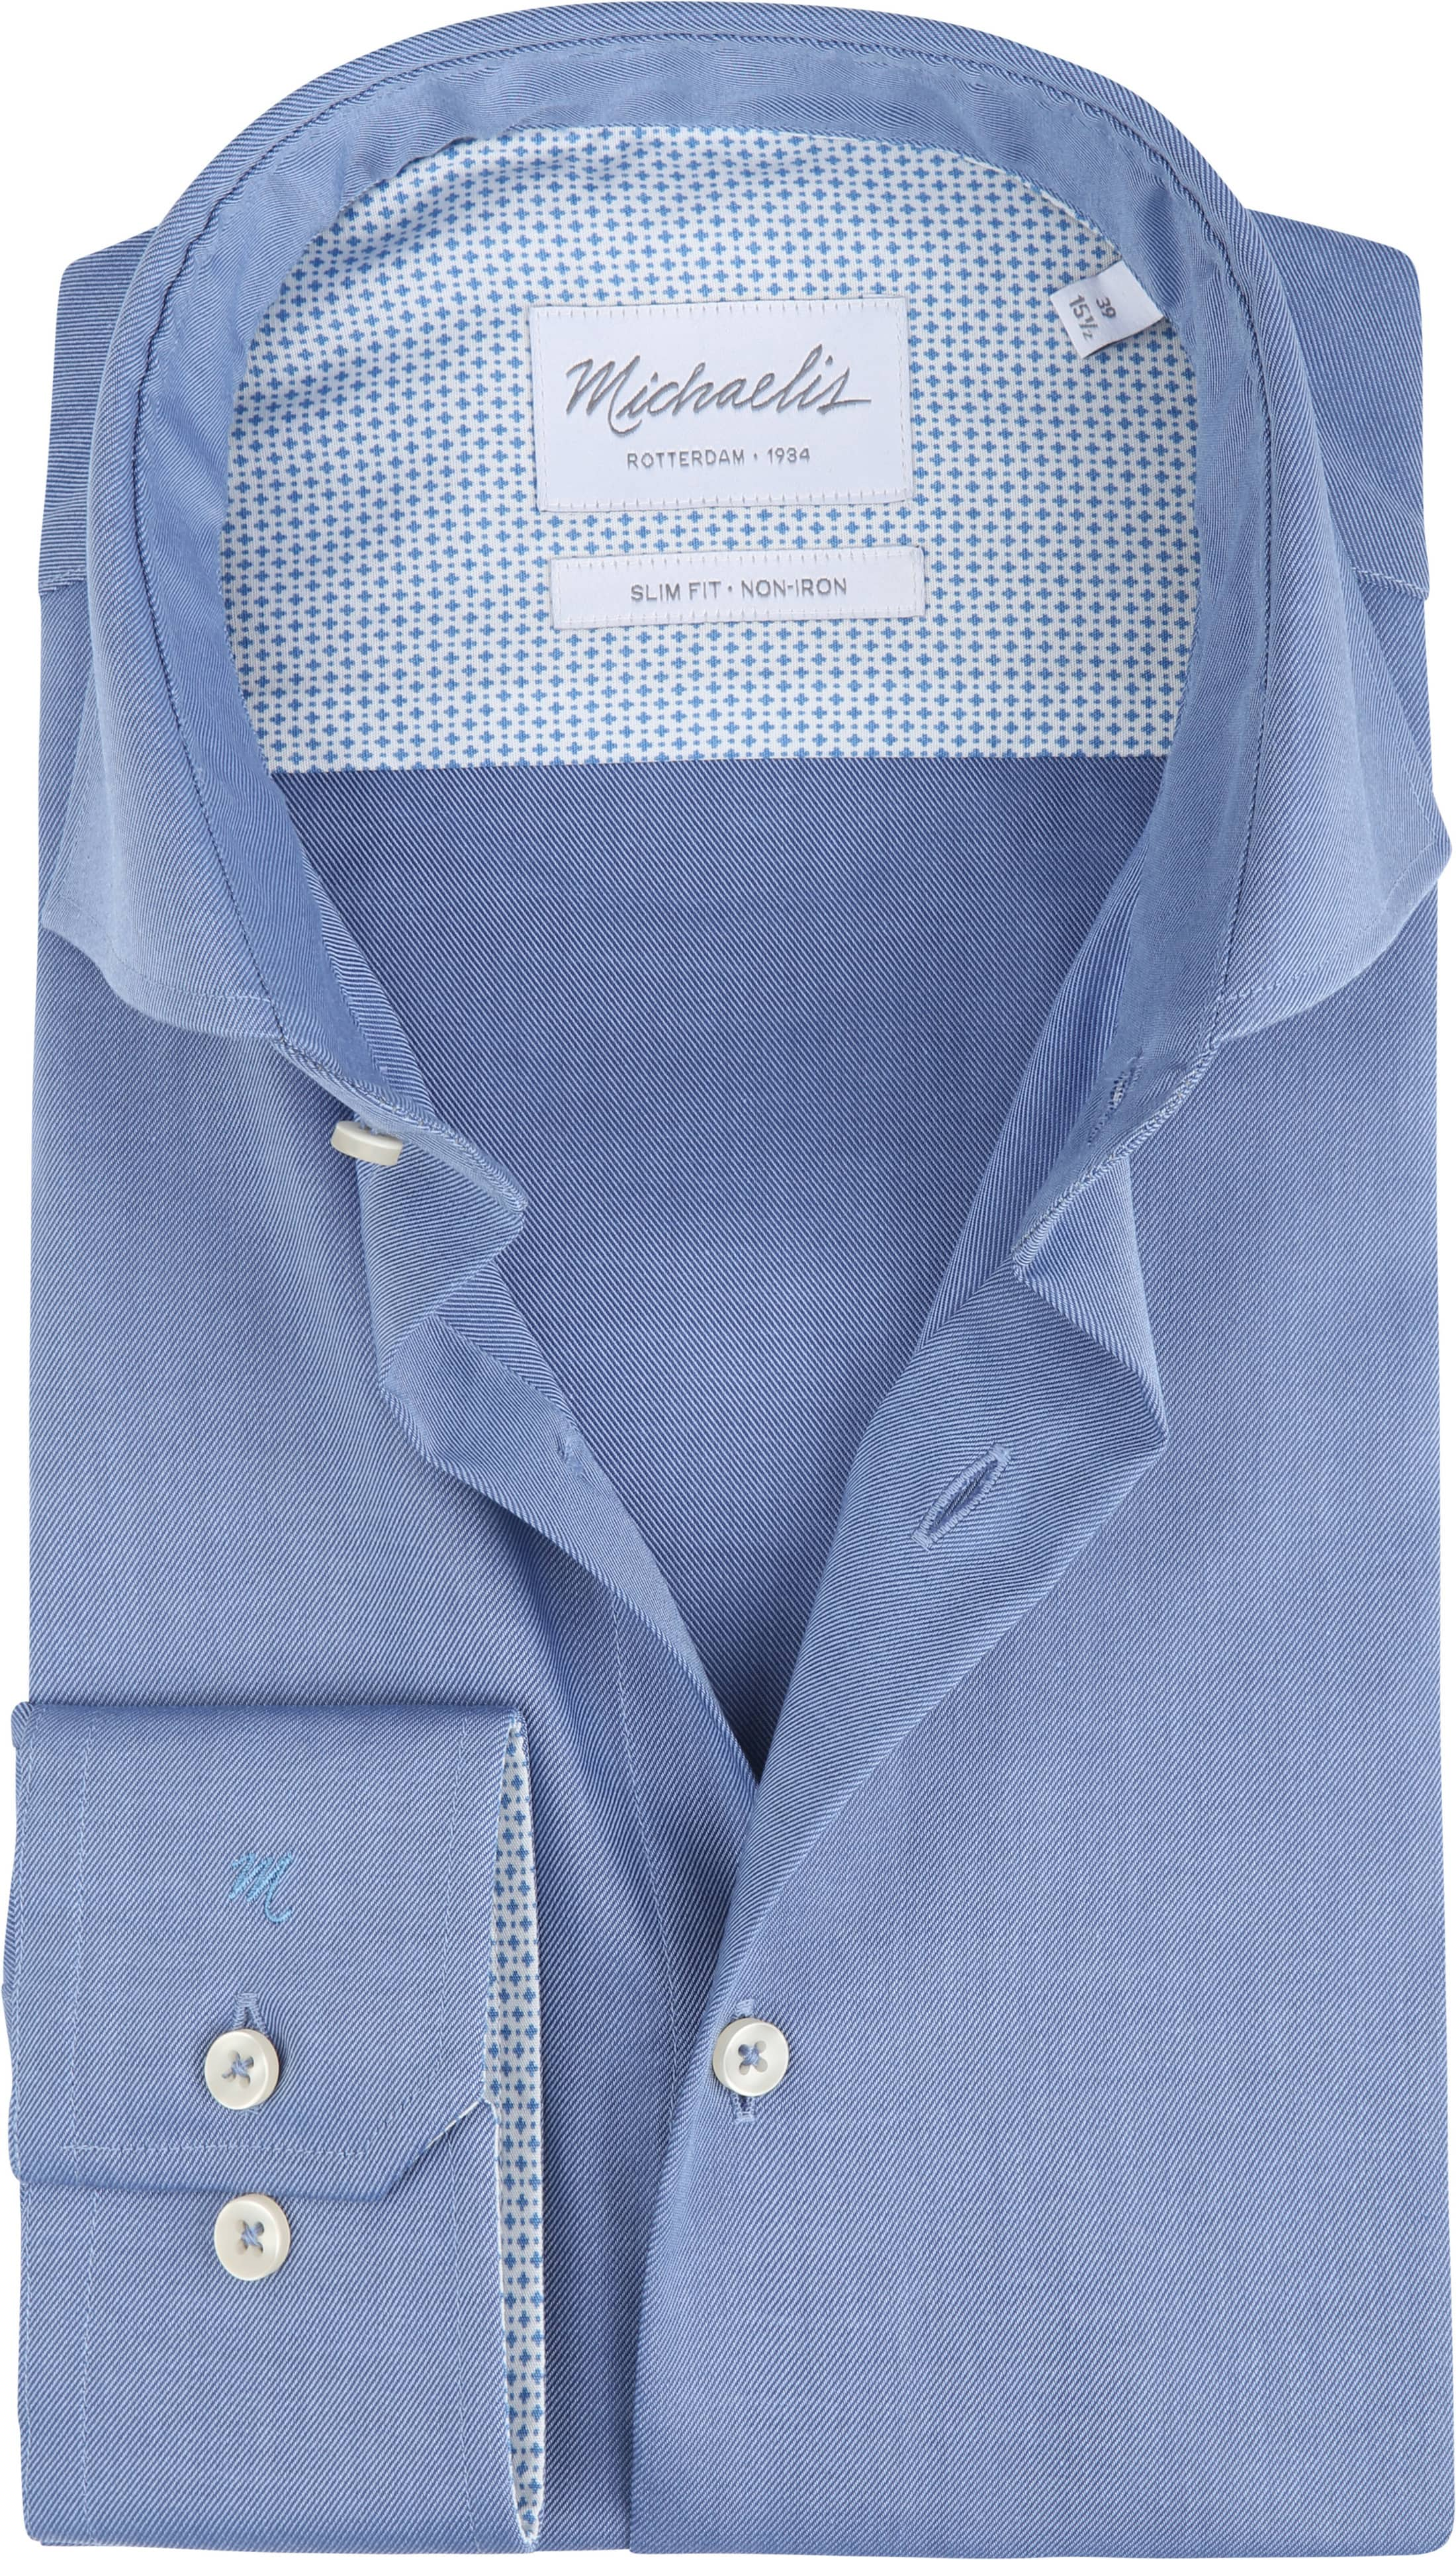 Michaelis Overhemd Strijkvrij Uni Blauw foto 0